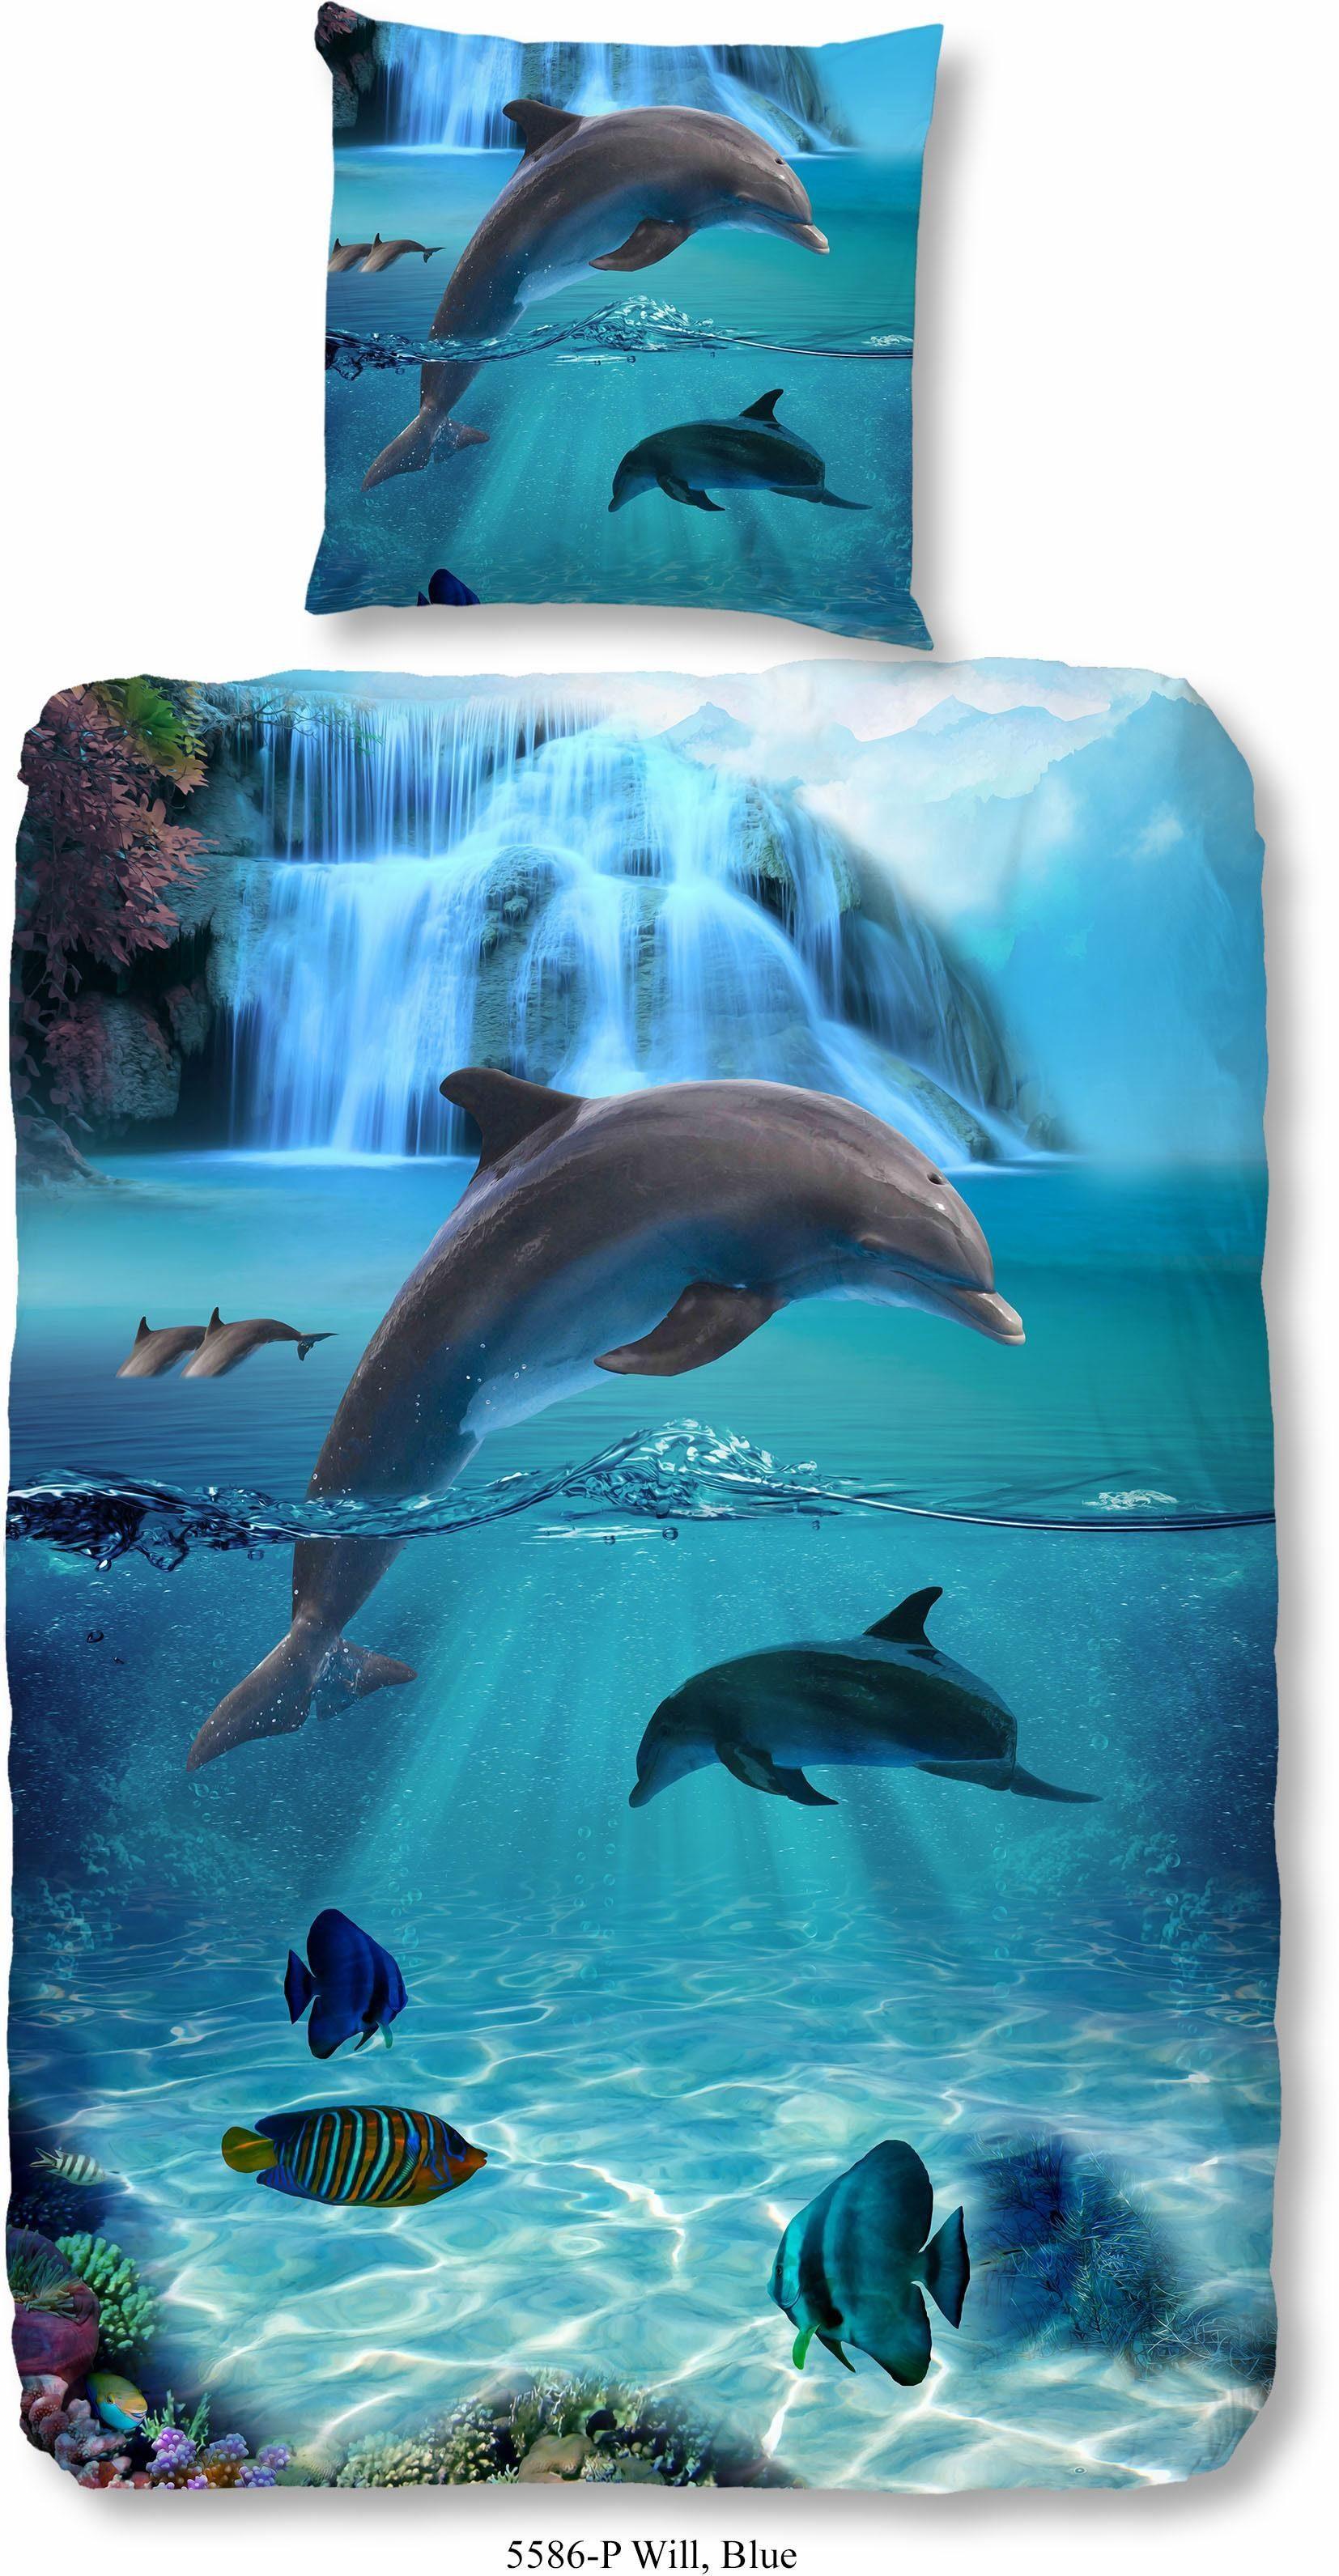 Kinderbettwäsche »Flipper«, good morning, mit Delfinmotiv